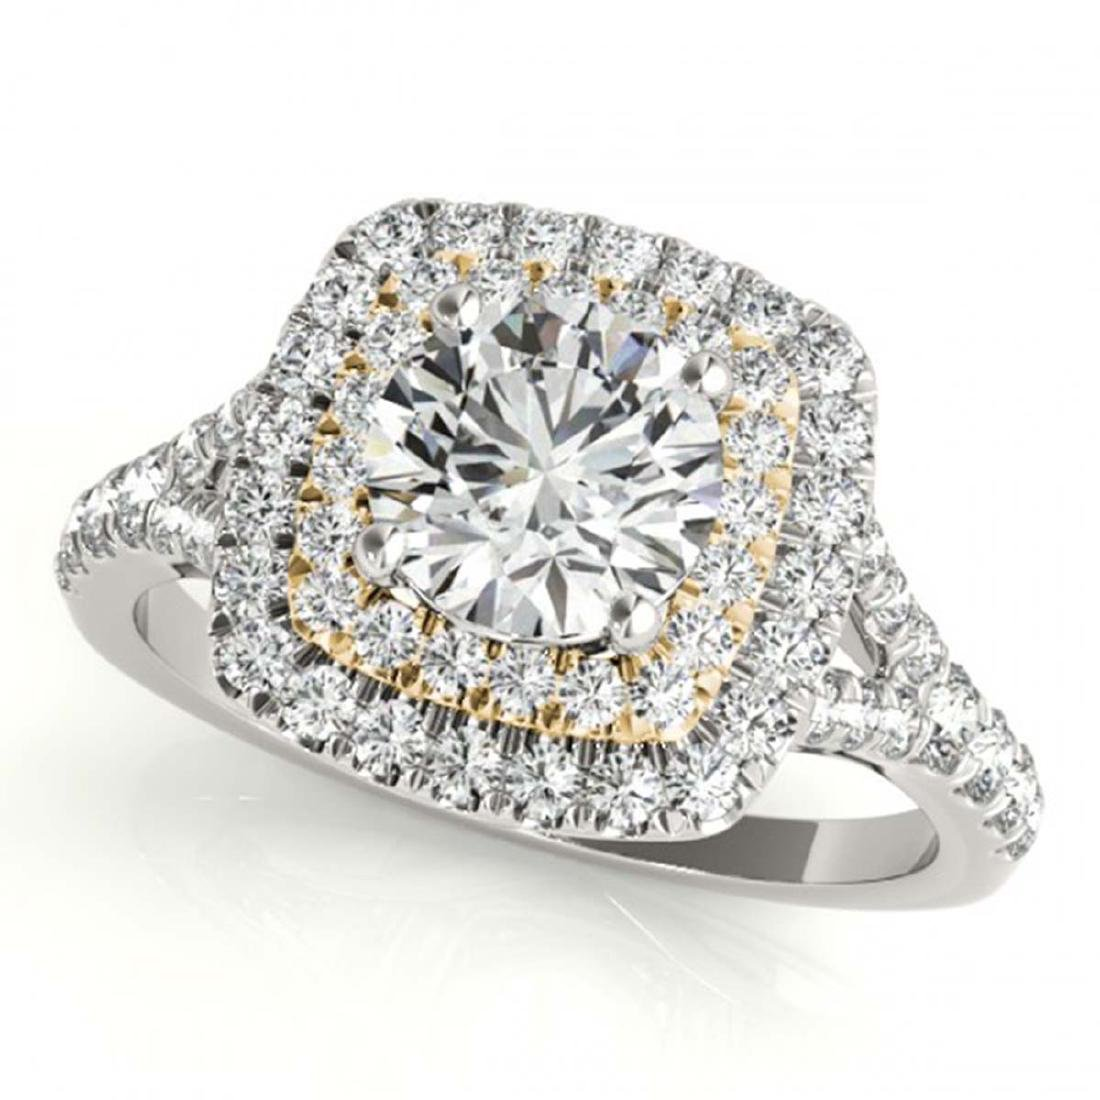 1.60 ctw VS/SI Diamond Solitaire Halo Ring 18K White &